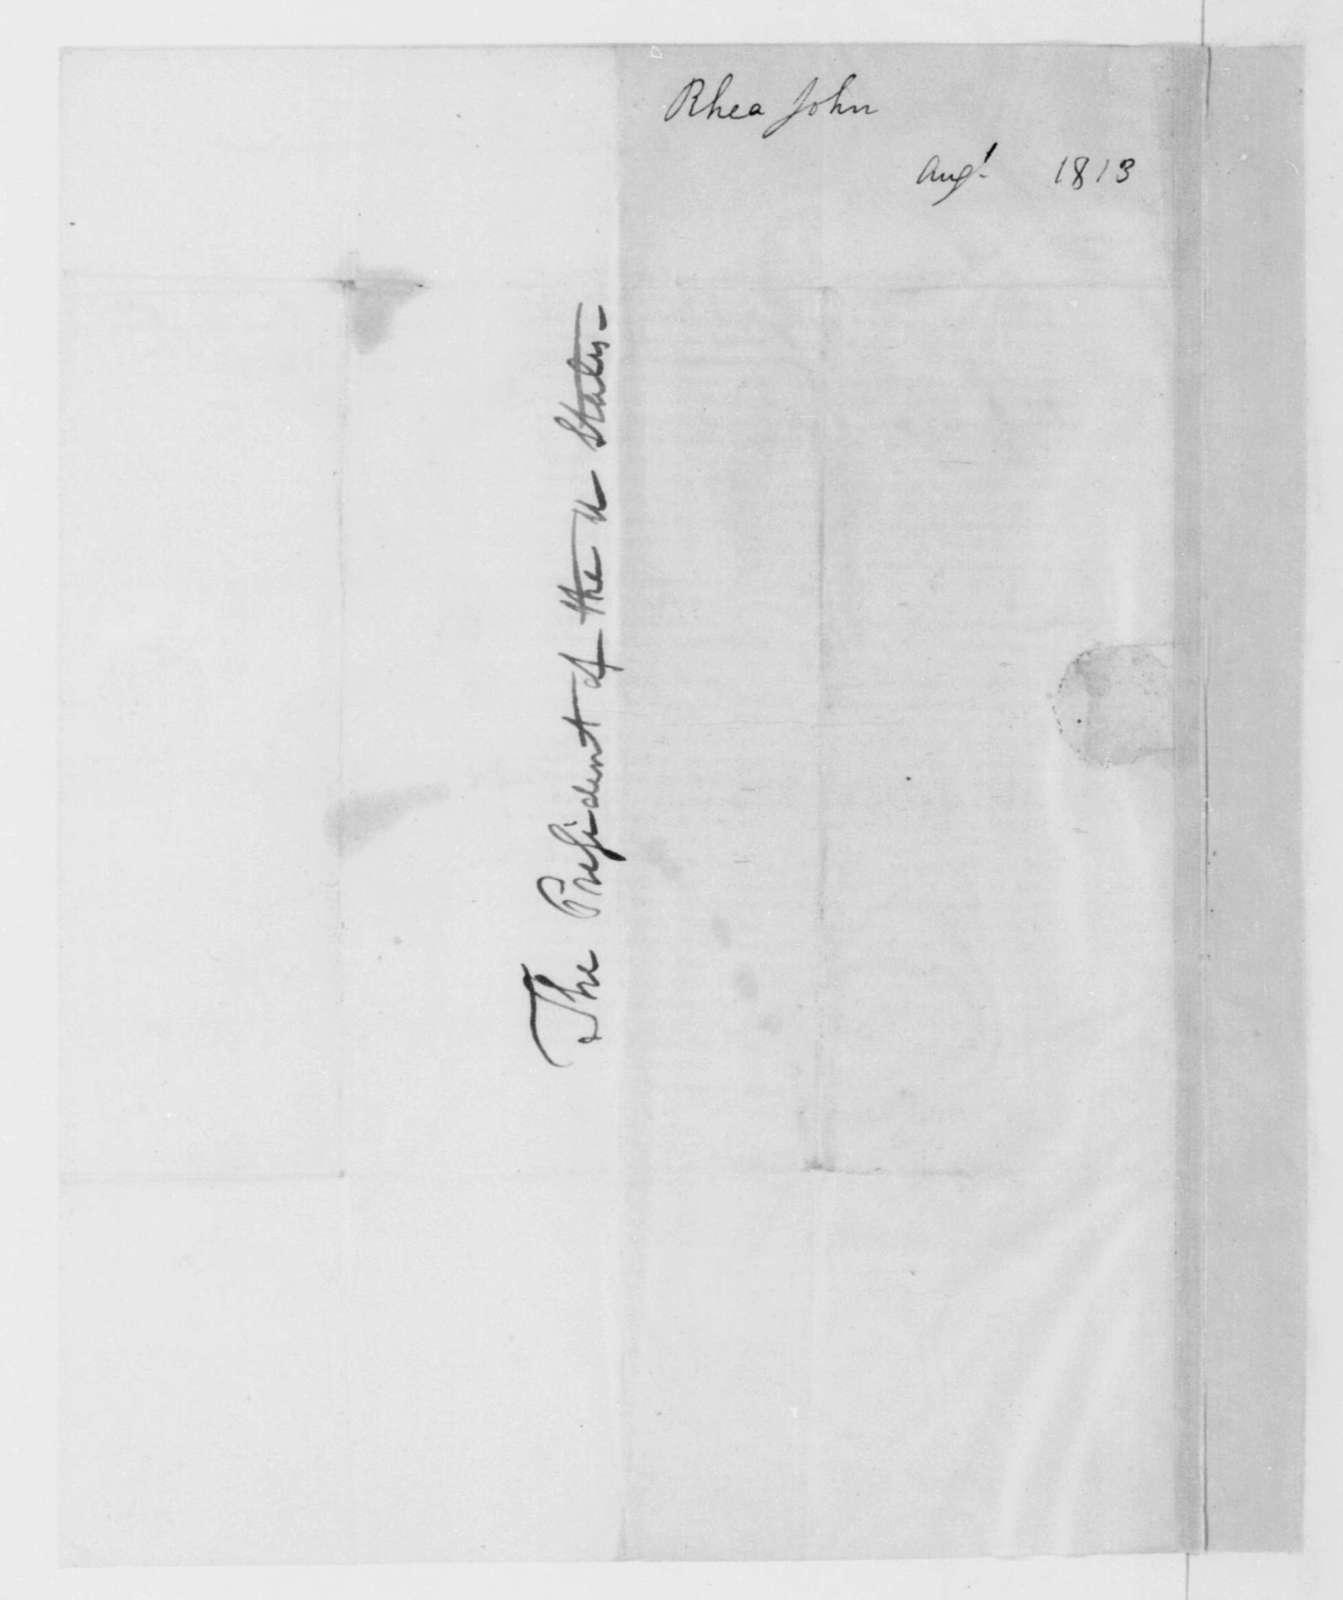 John Rhea to James Madison, August 5, 1813.